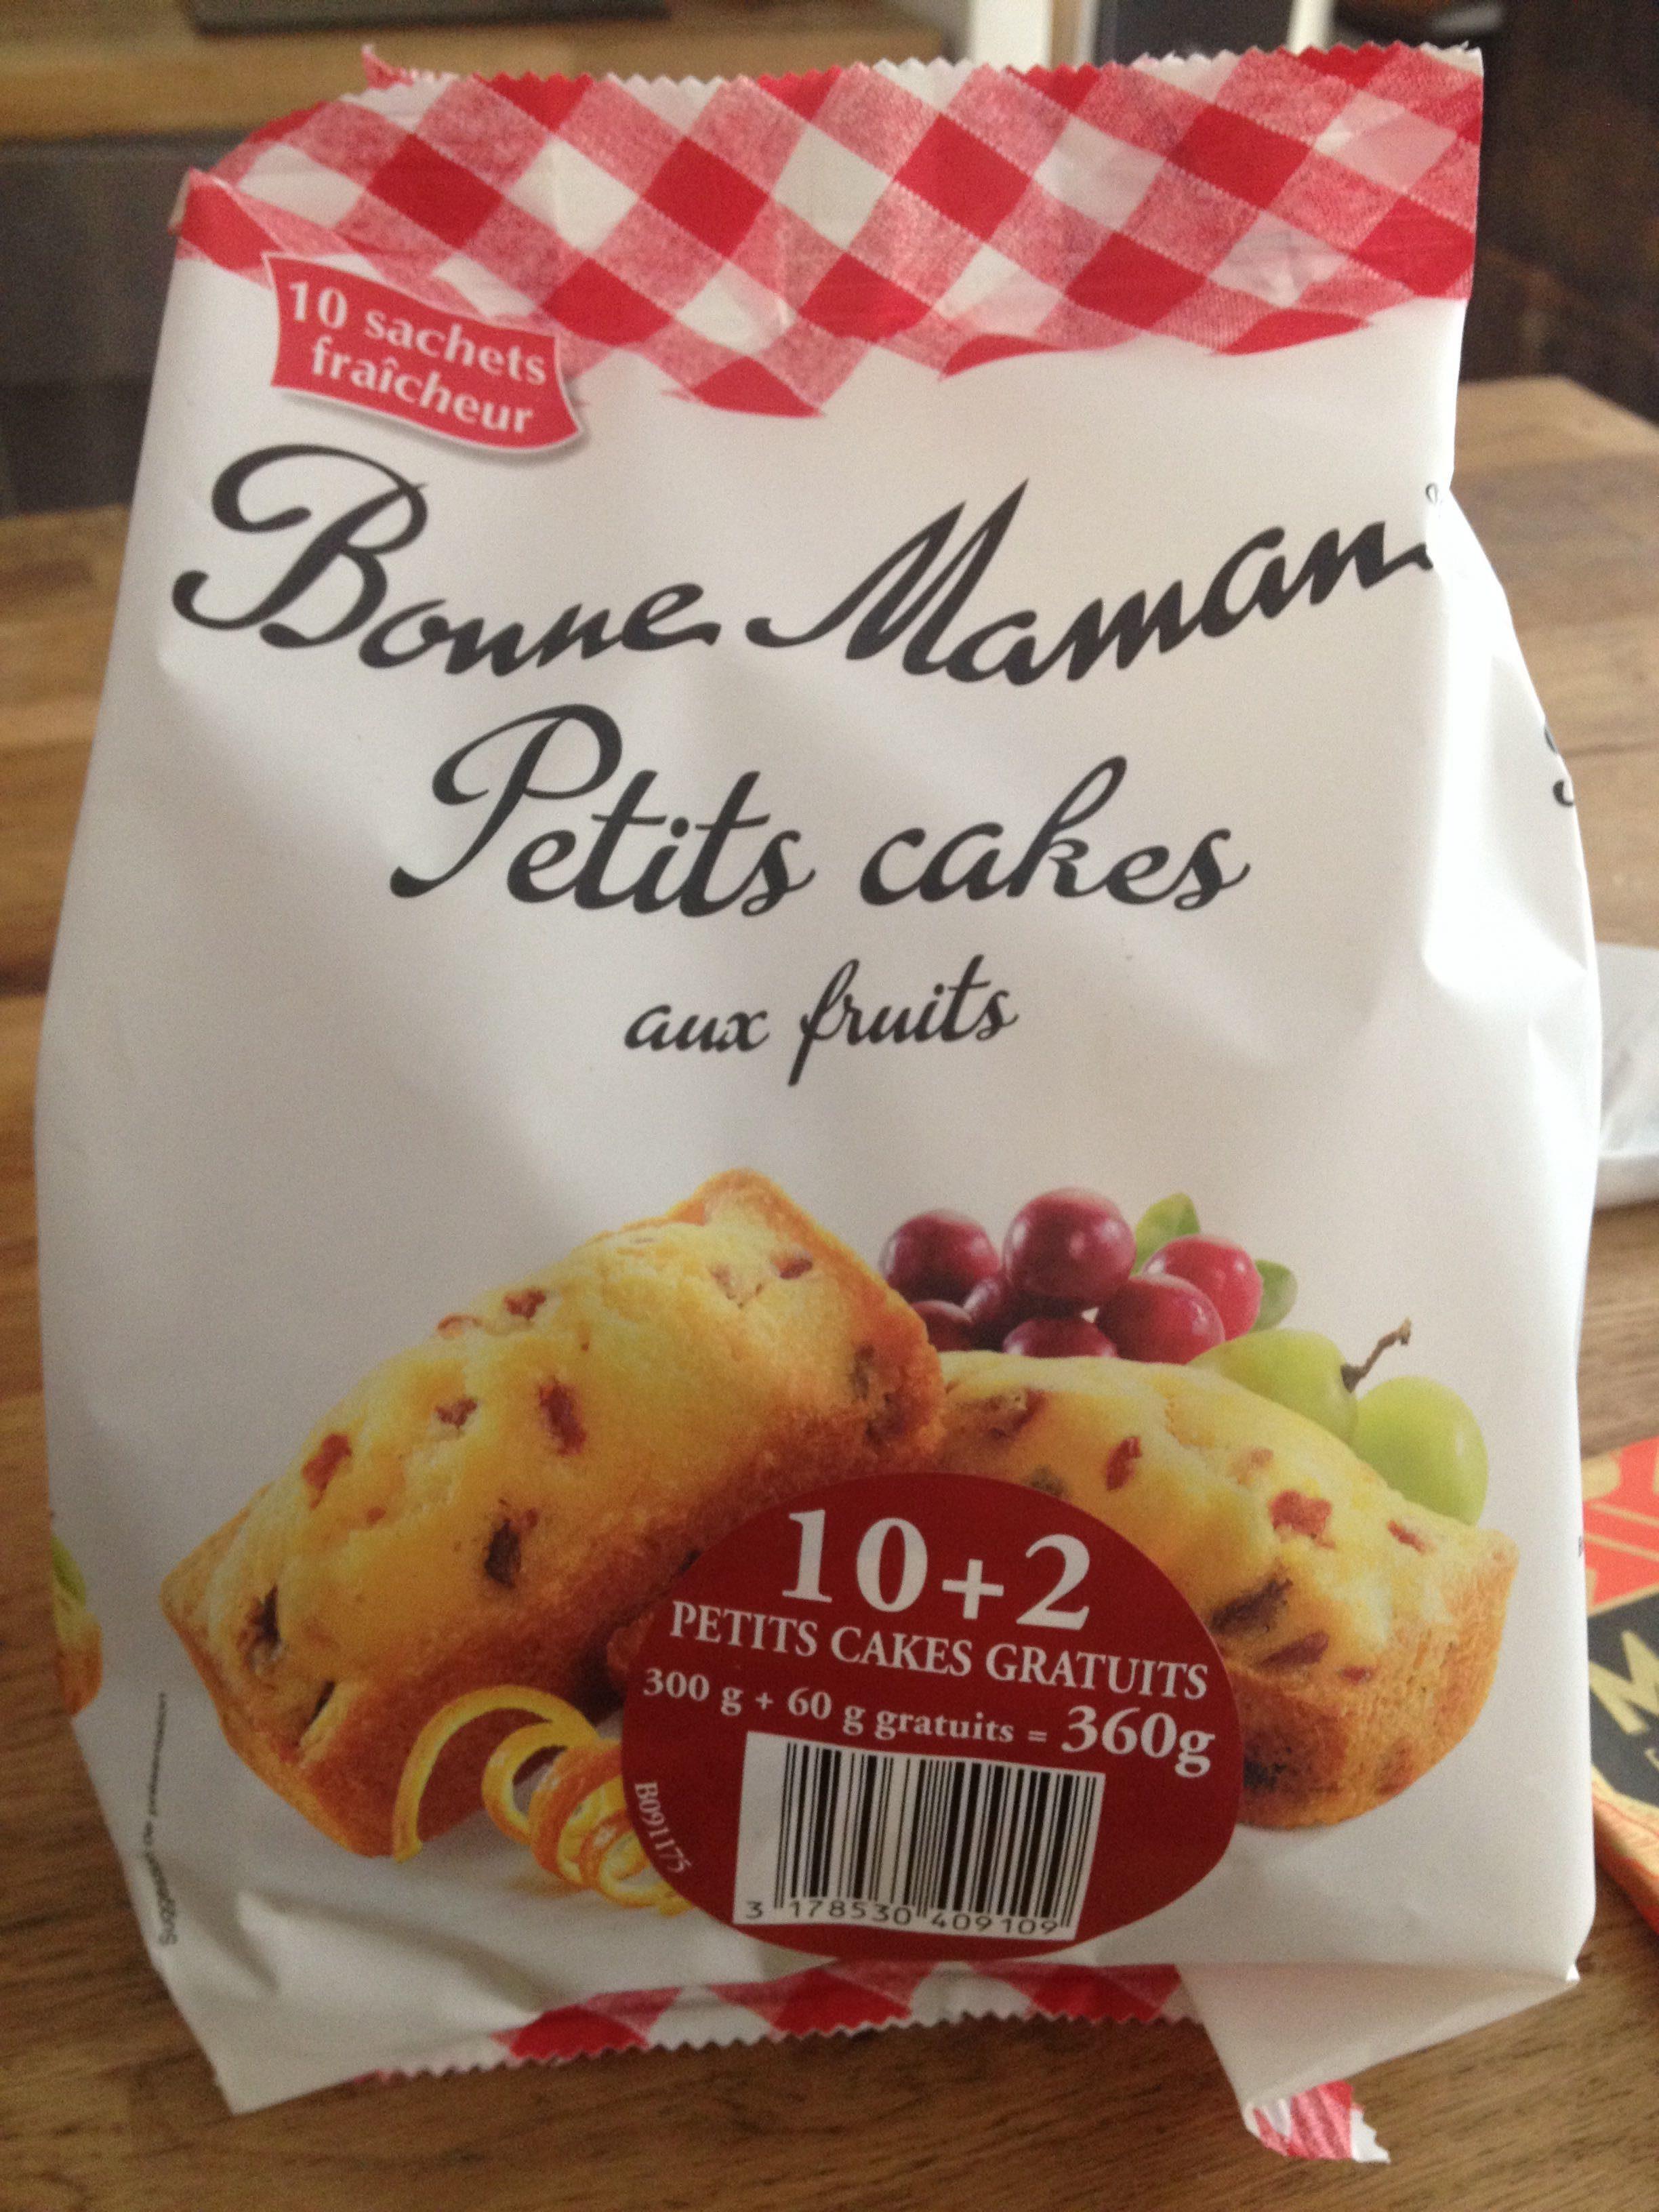 Petits cakes aux fruits - Product - fr